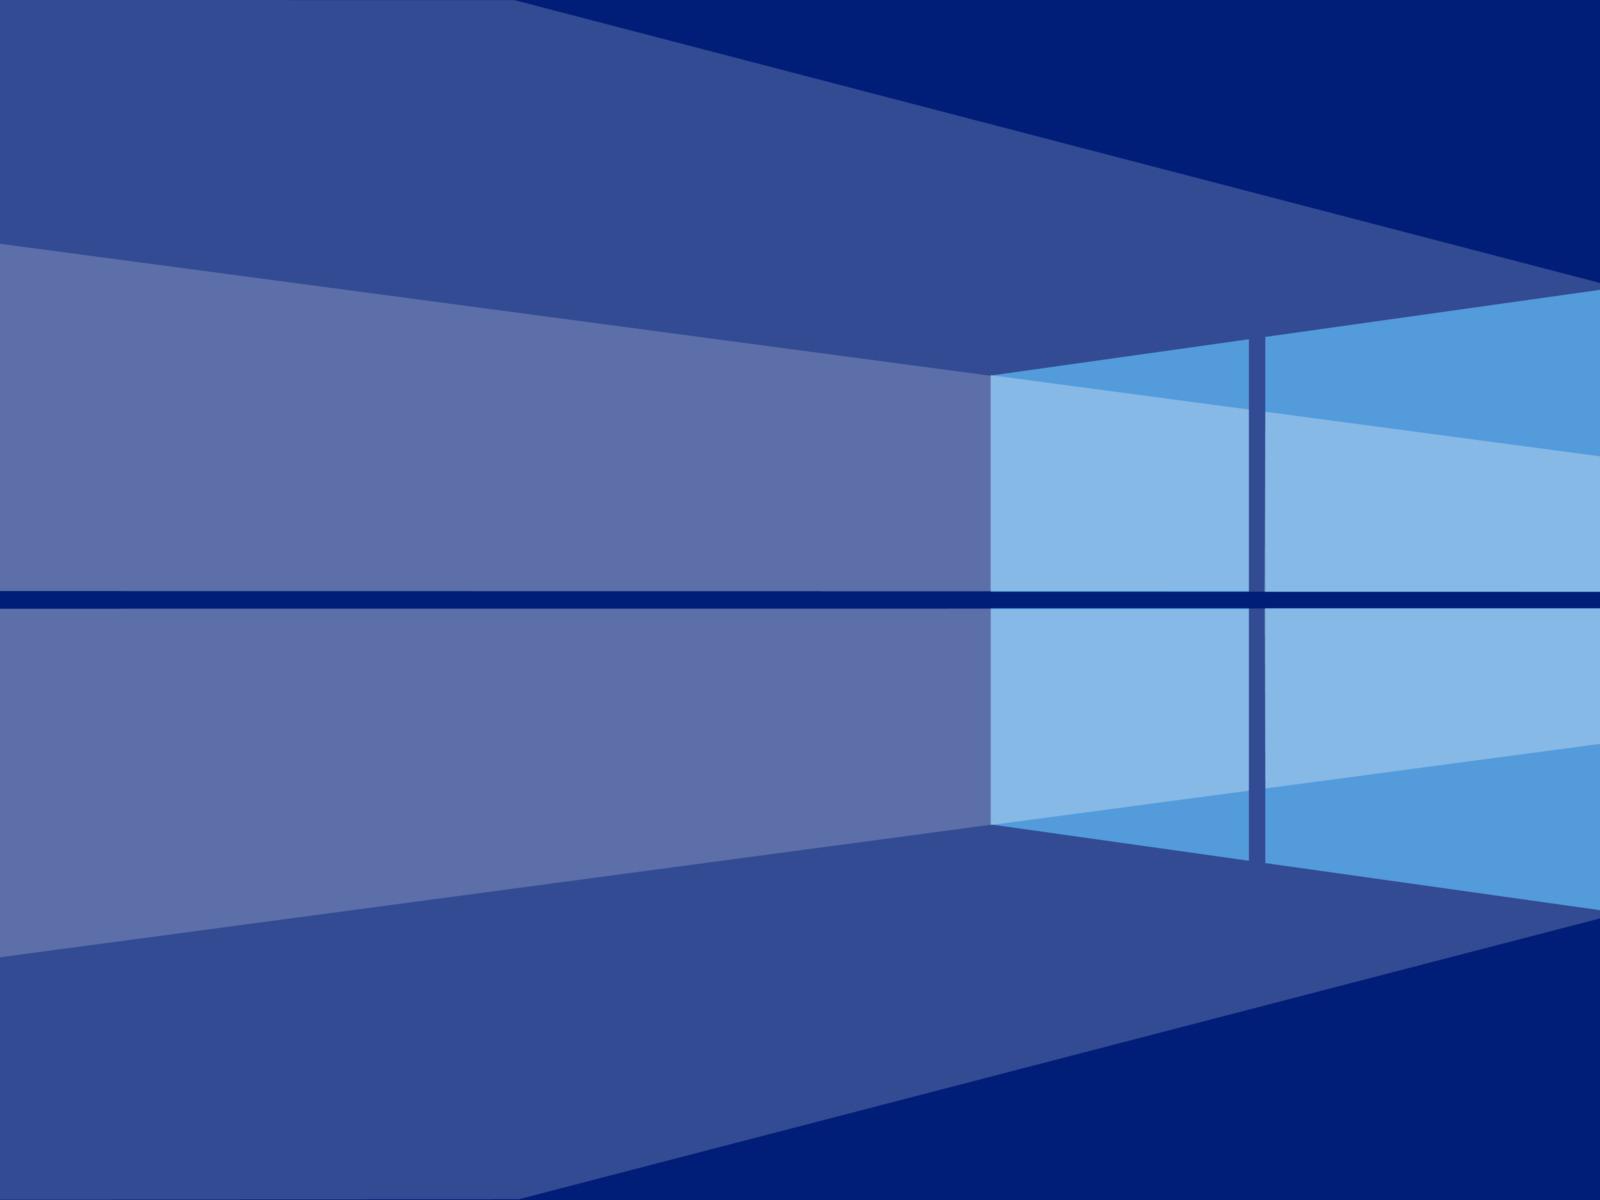 1600x1200 Windows 10 Original 4k 1600x1200 Resolution Hd 4k